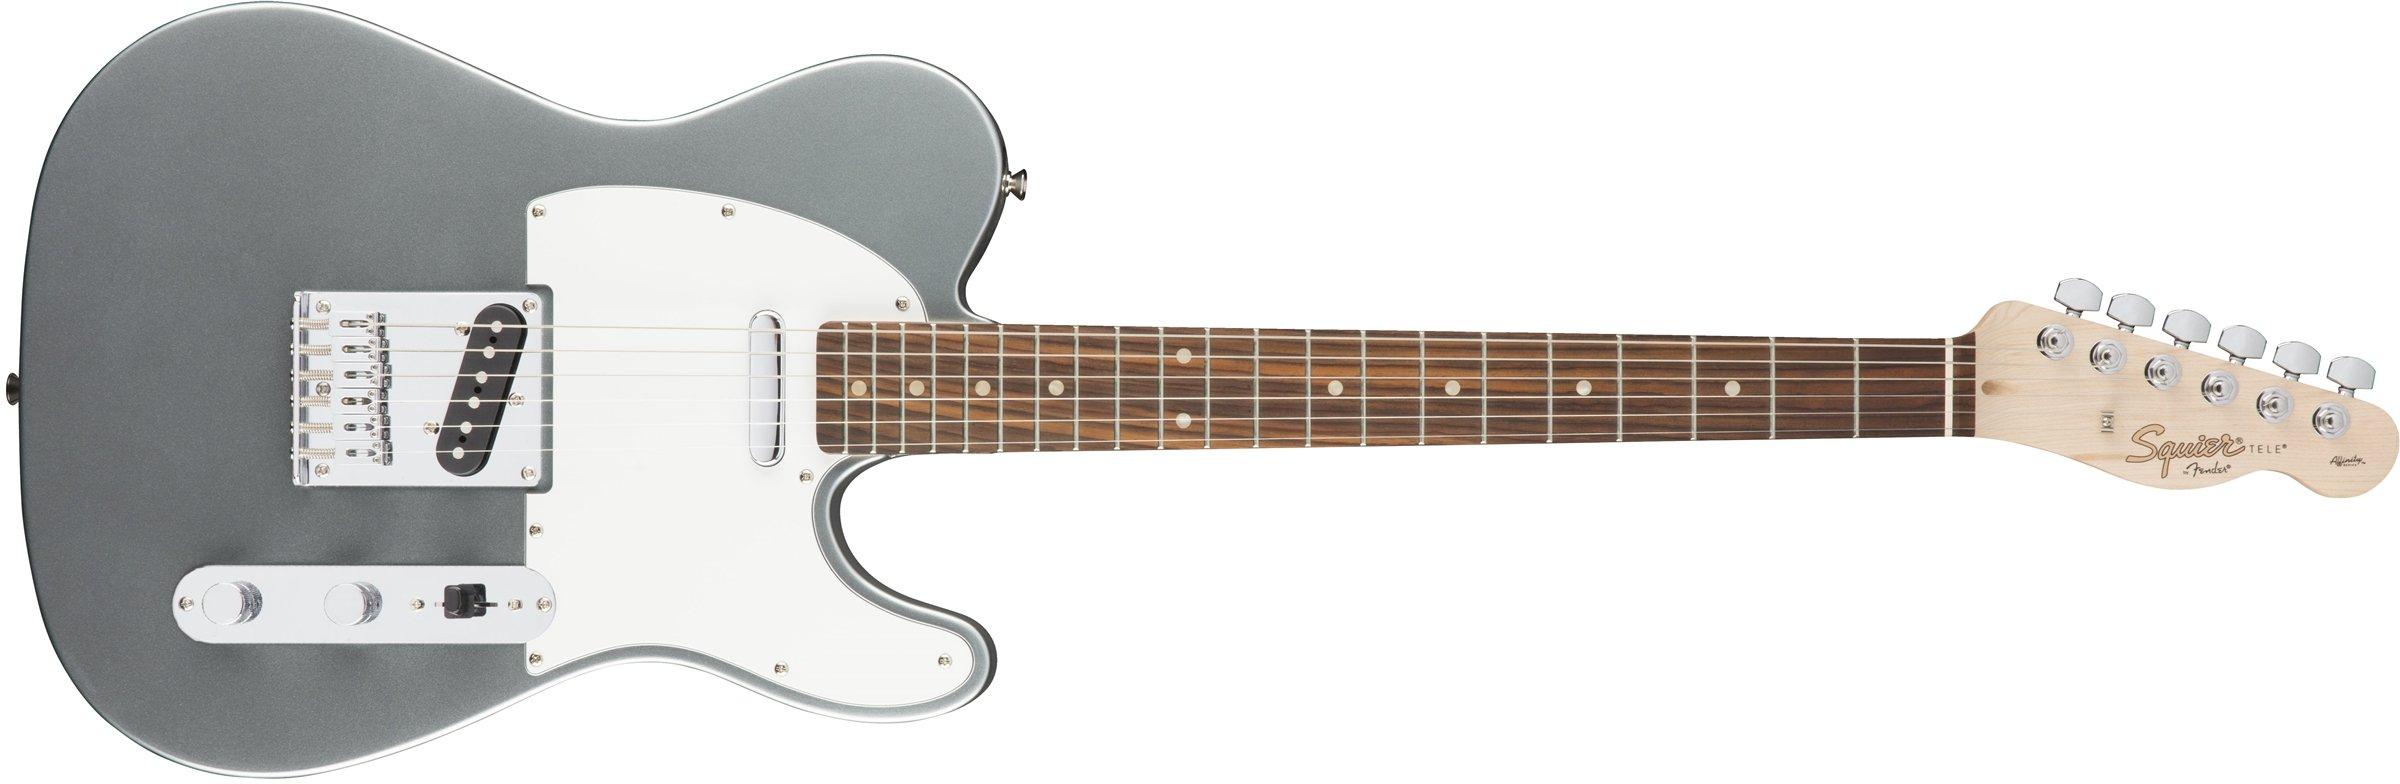 Squier by Fender Affinity Telecaster Beginner Electric Guitar - Rosewood Fingerboard, Slick Silver by Fender